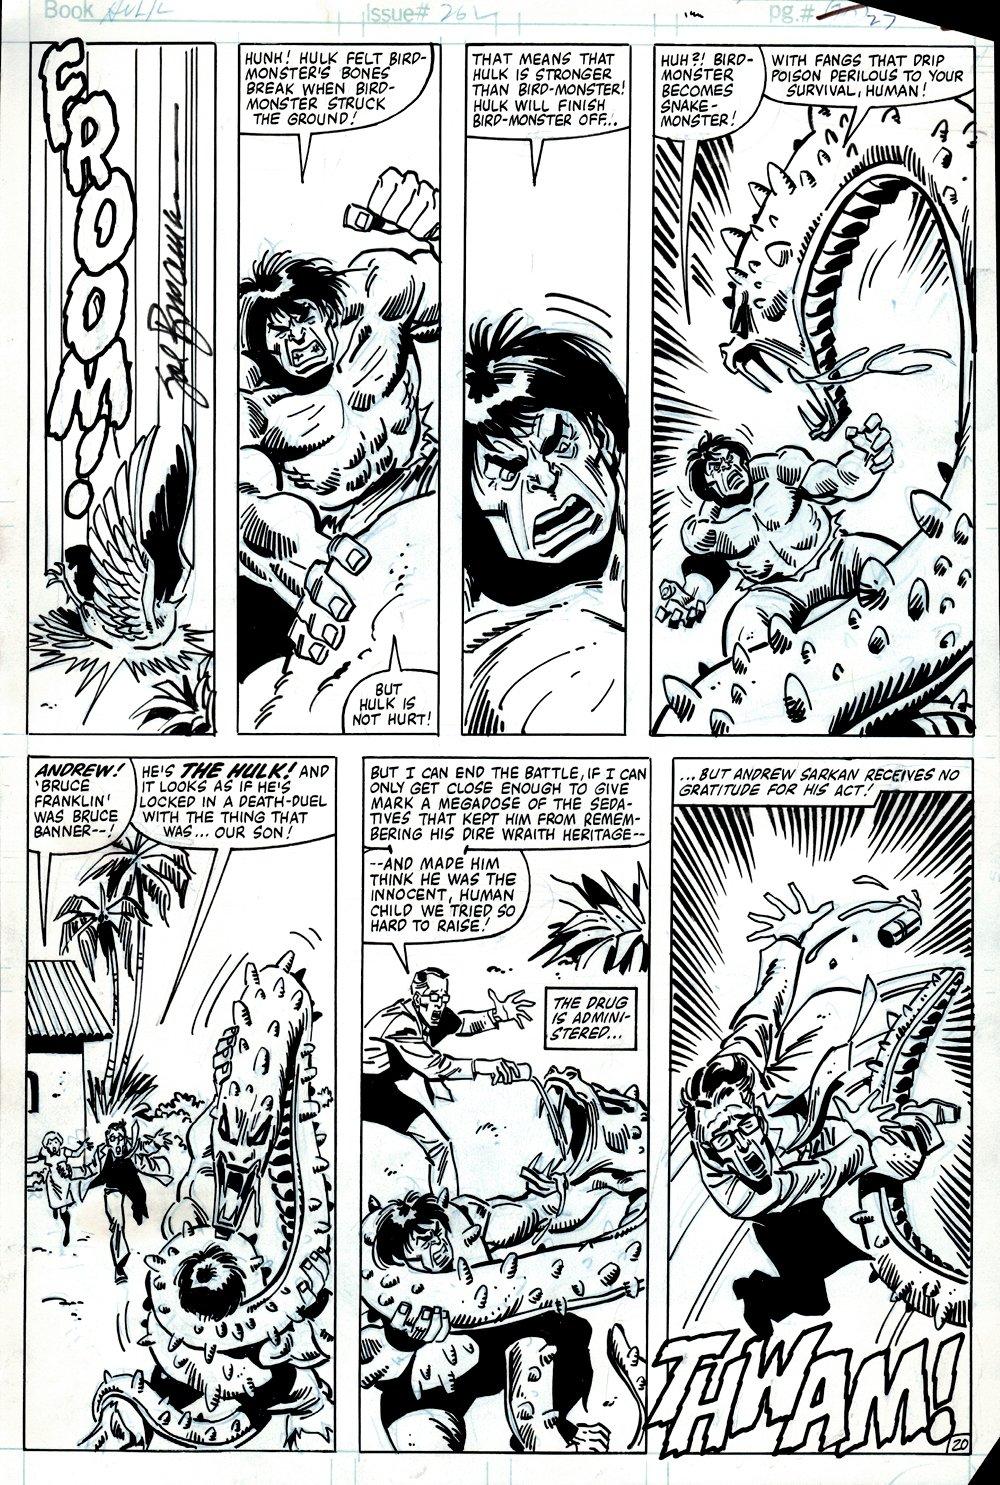 Incredible Hulk #262 p 20 (HULK'S VERY FIRST BATTLE WITH 'ROM' DIRE WRAITH MONSTER: KATTAN-TU!) 1981